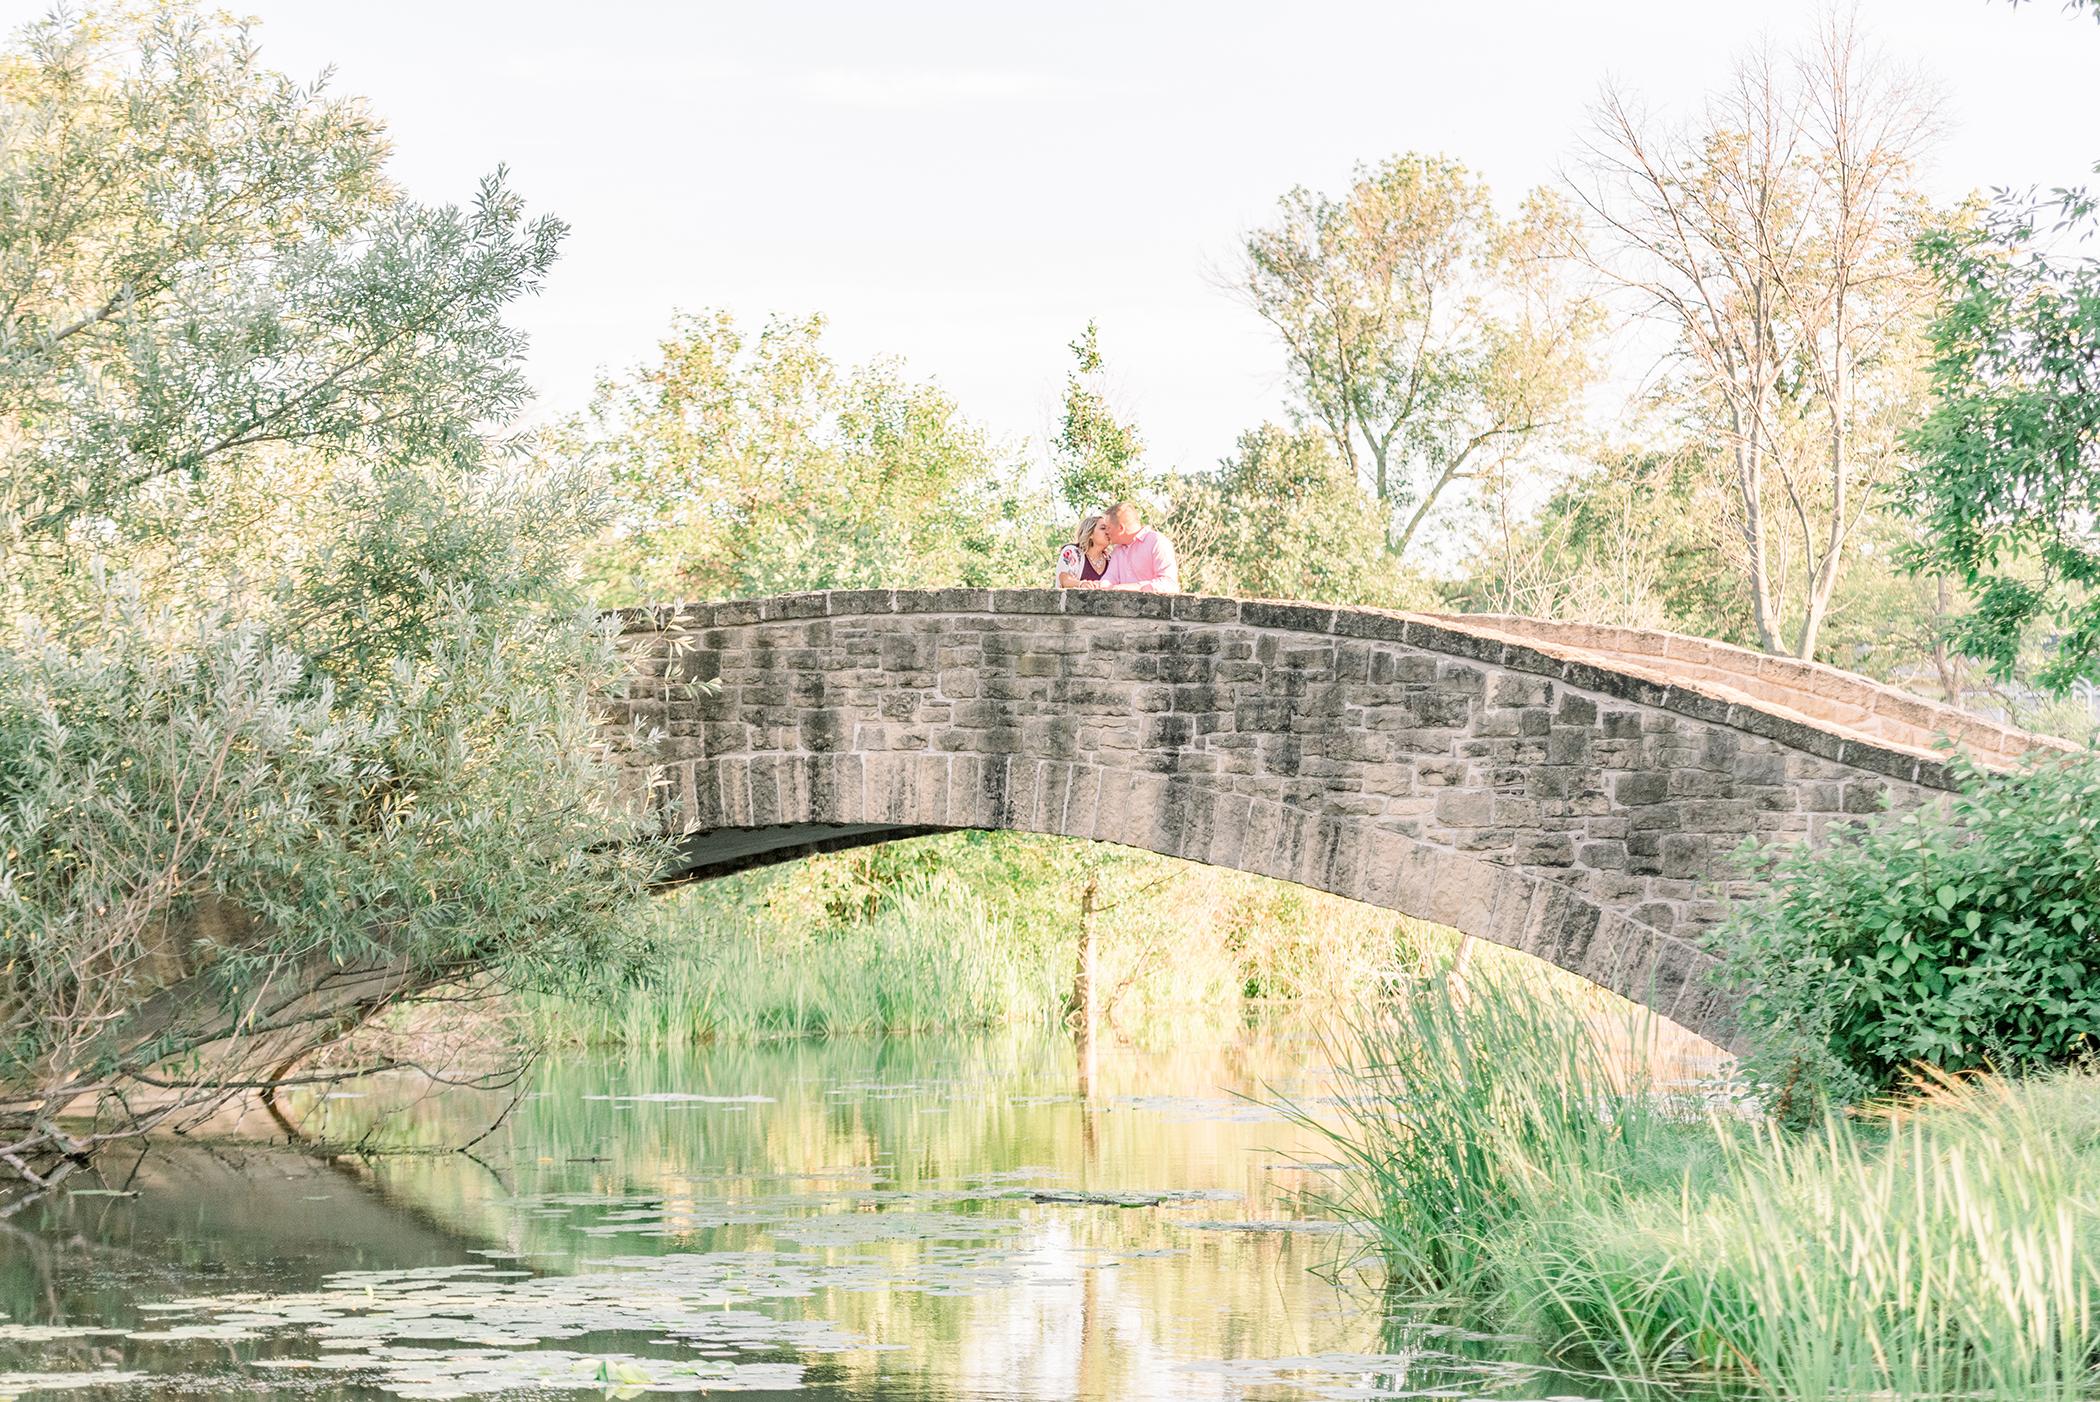 Tenney Park Locks Engagement Session